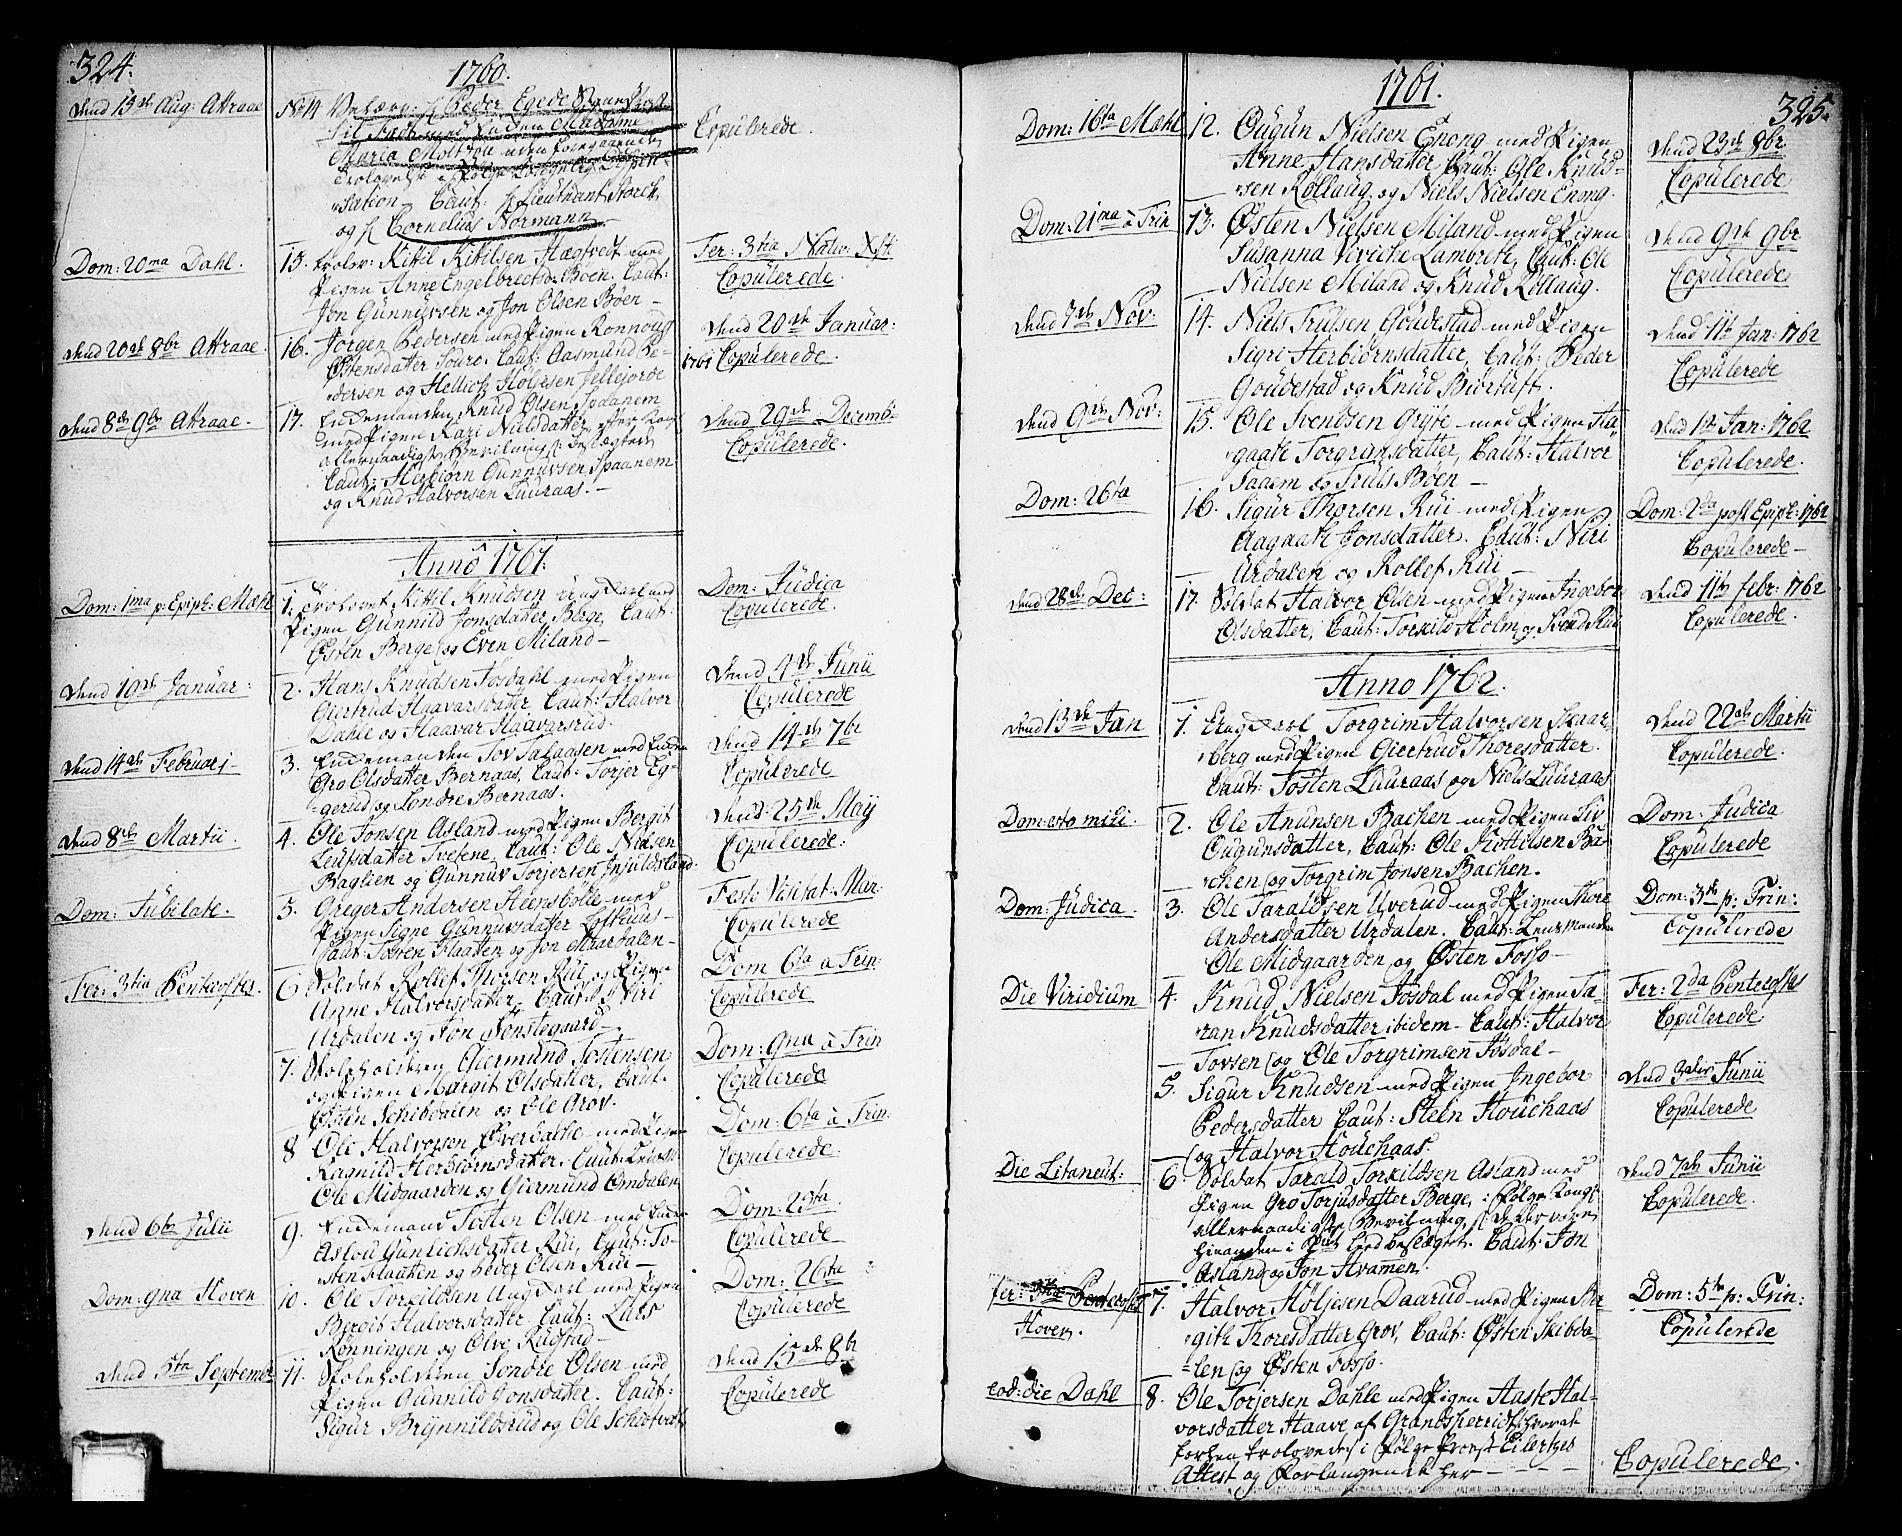 SAKO, Tinn kirkebøker, F/Fa/L0002: Ministerialbok nr. I 2, 1757-1810, s. 324-325